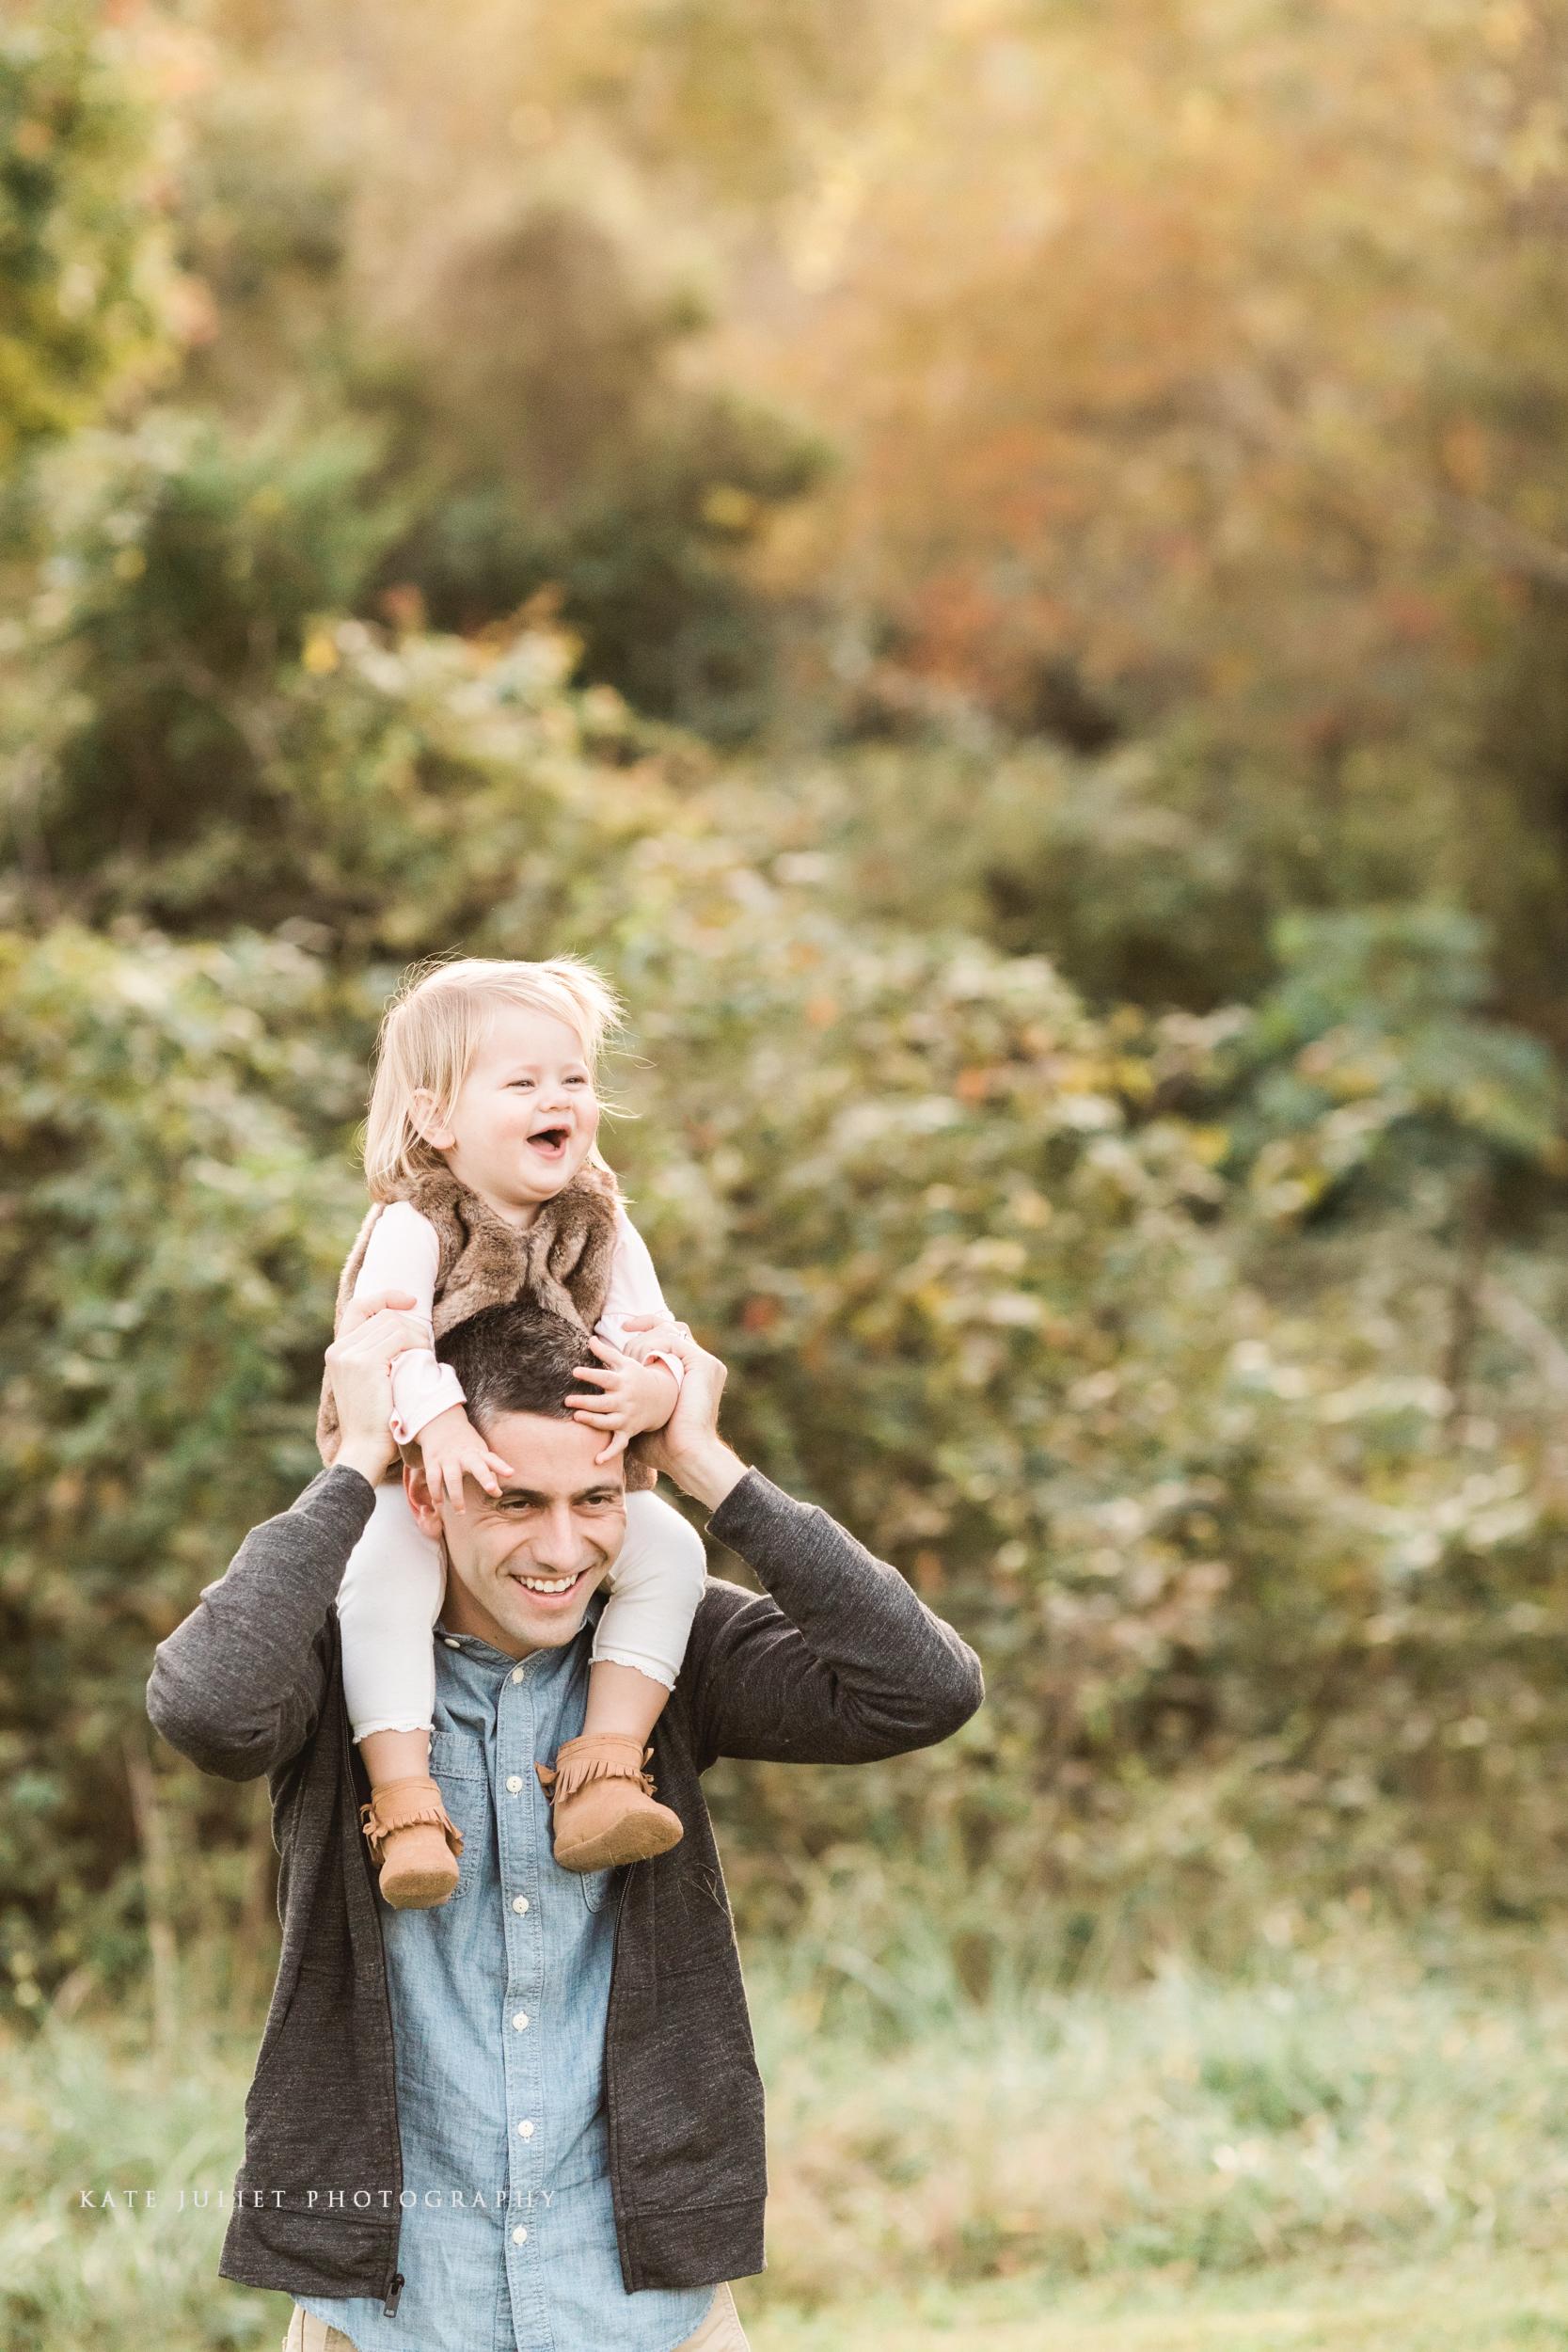 Loudoun County Family Photographer | Kate Juliet Photography